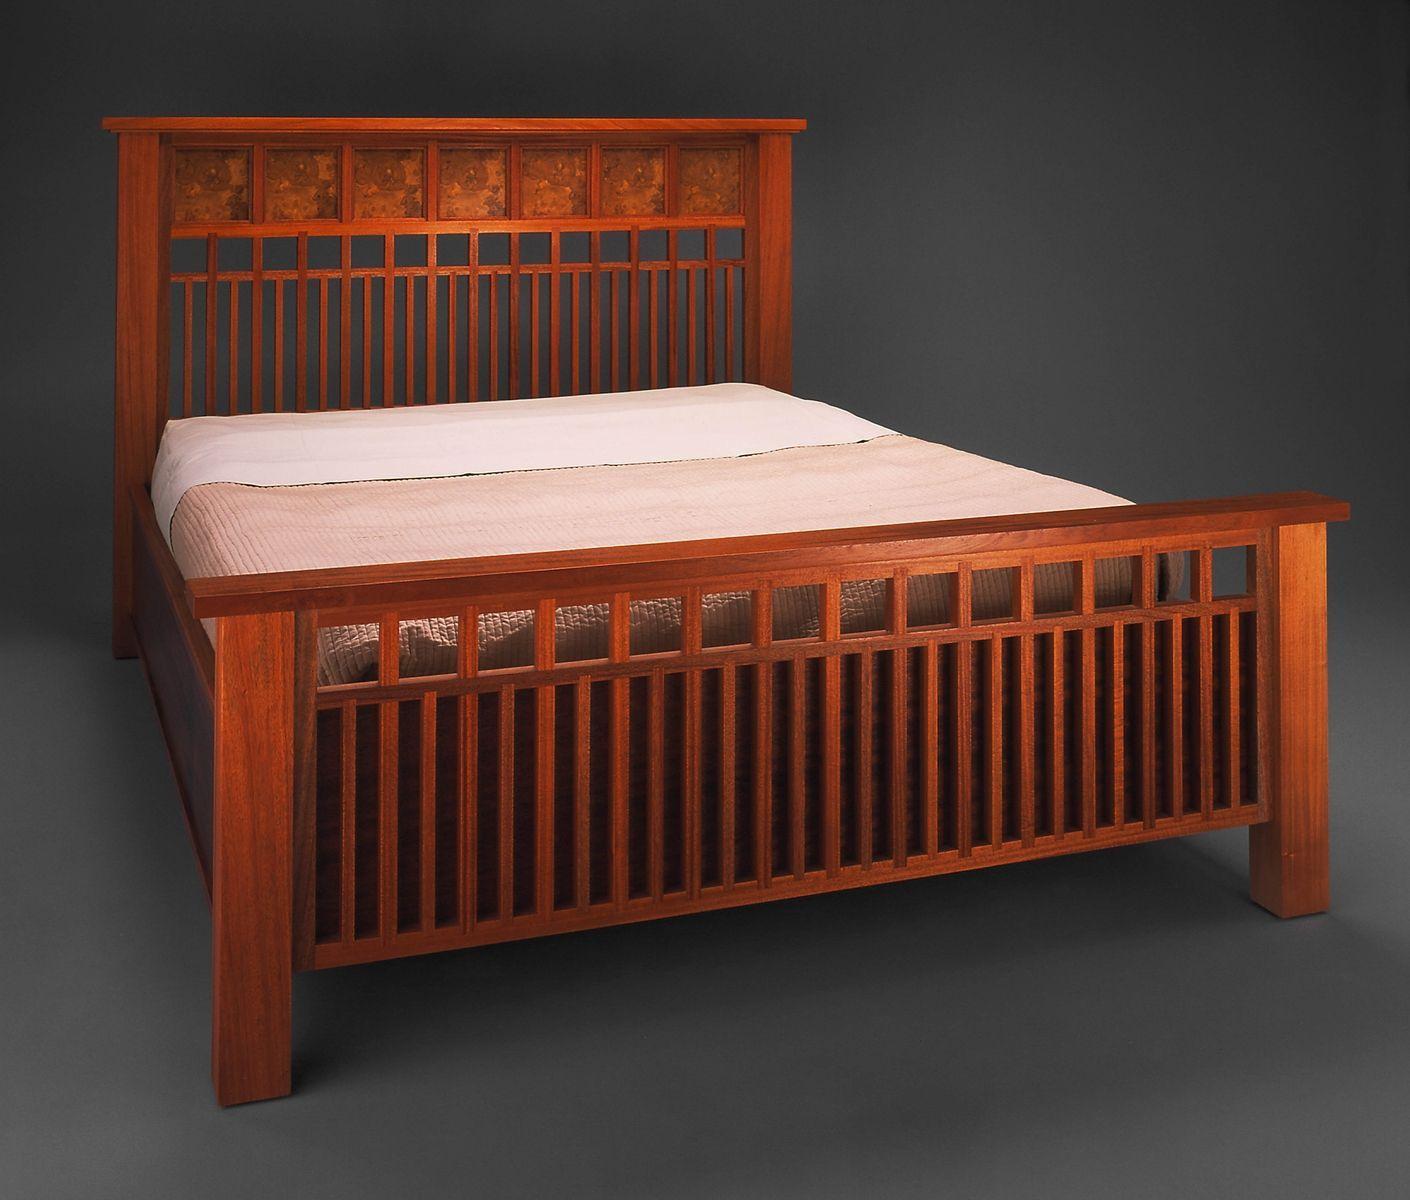 Custom Made Caroline's Bed Mission style furniture, Bed